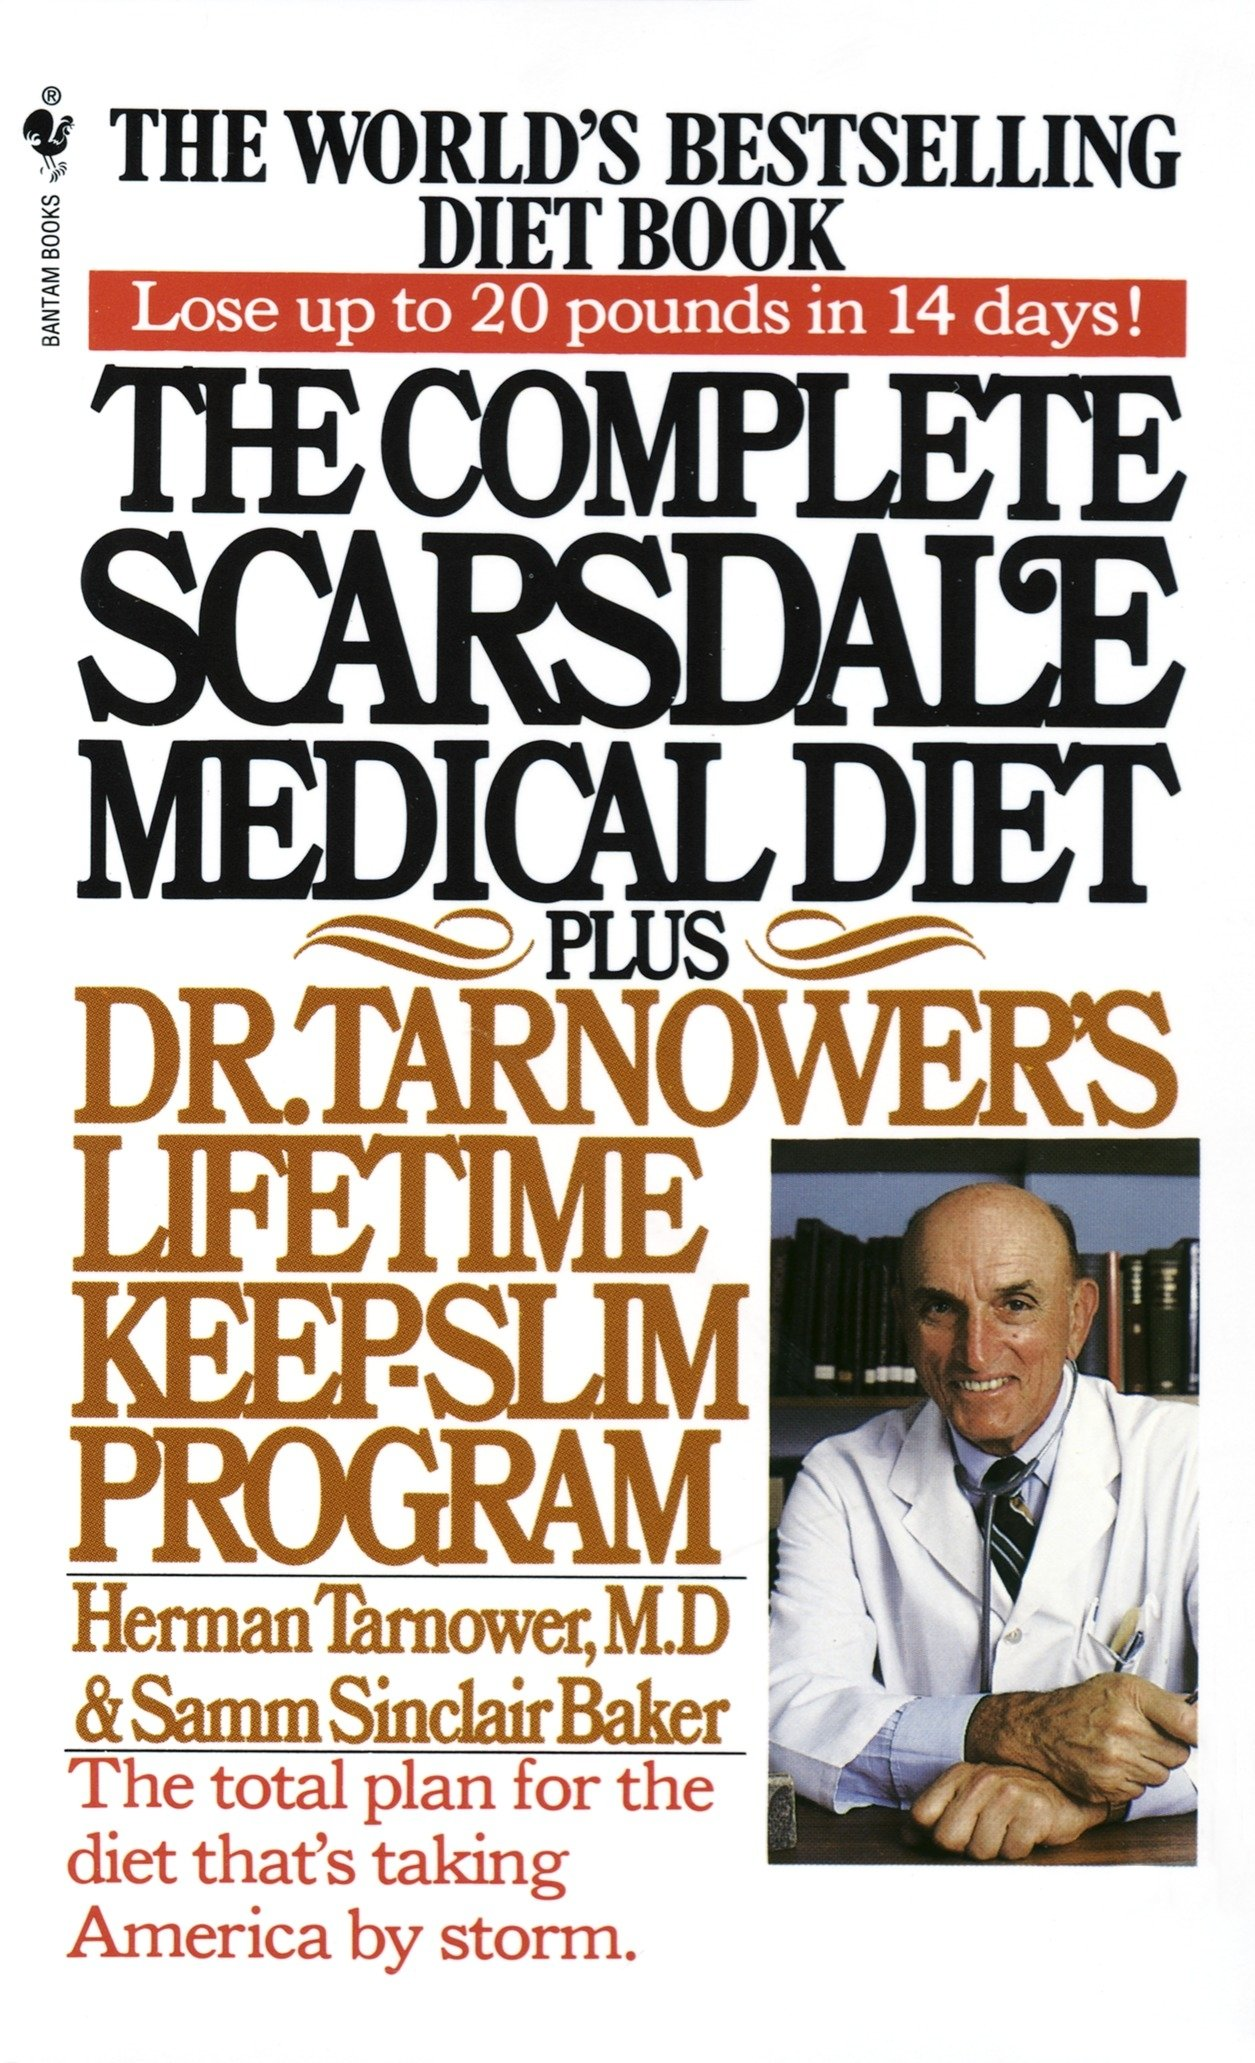 scarsdale medical diet plan